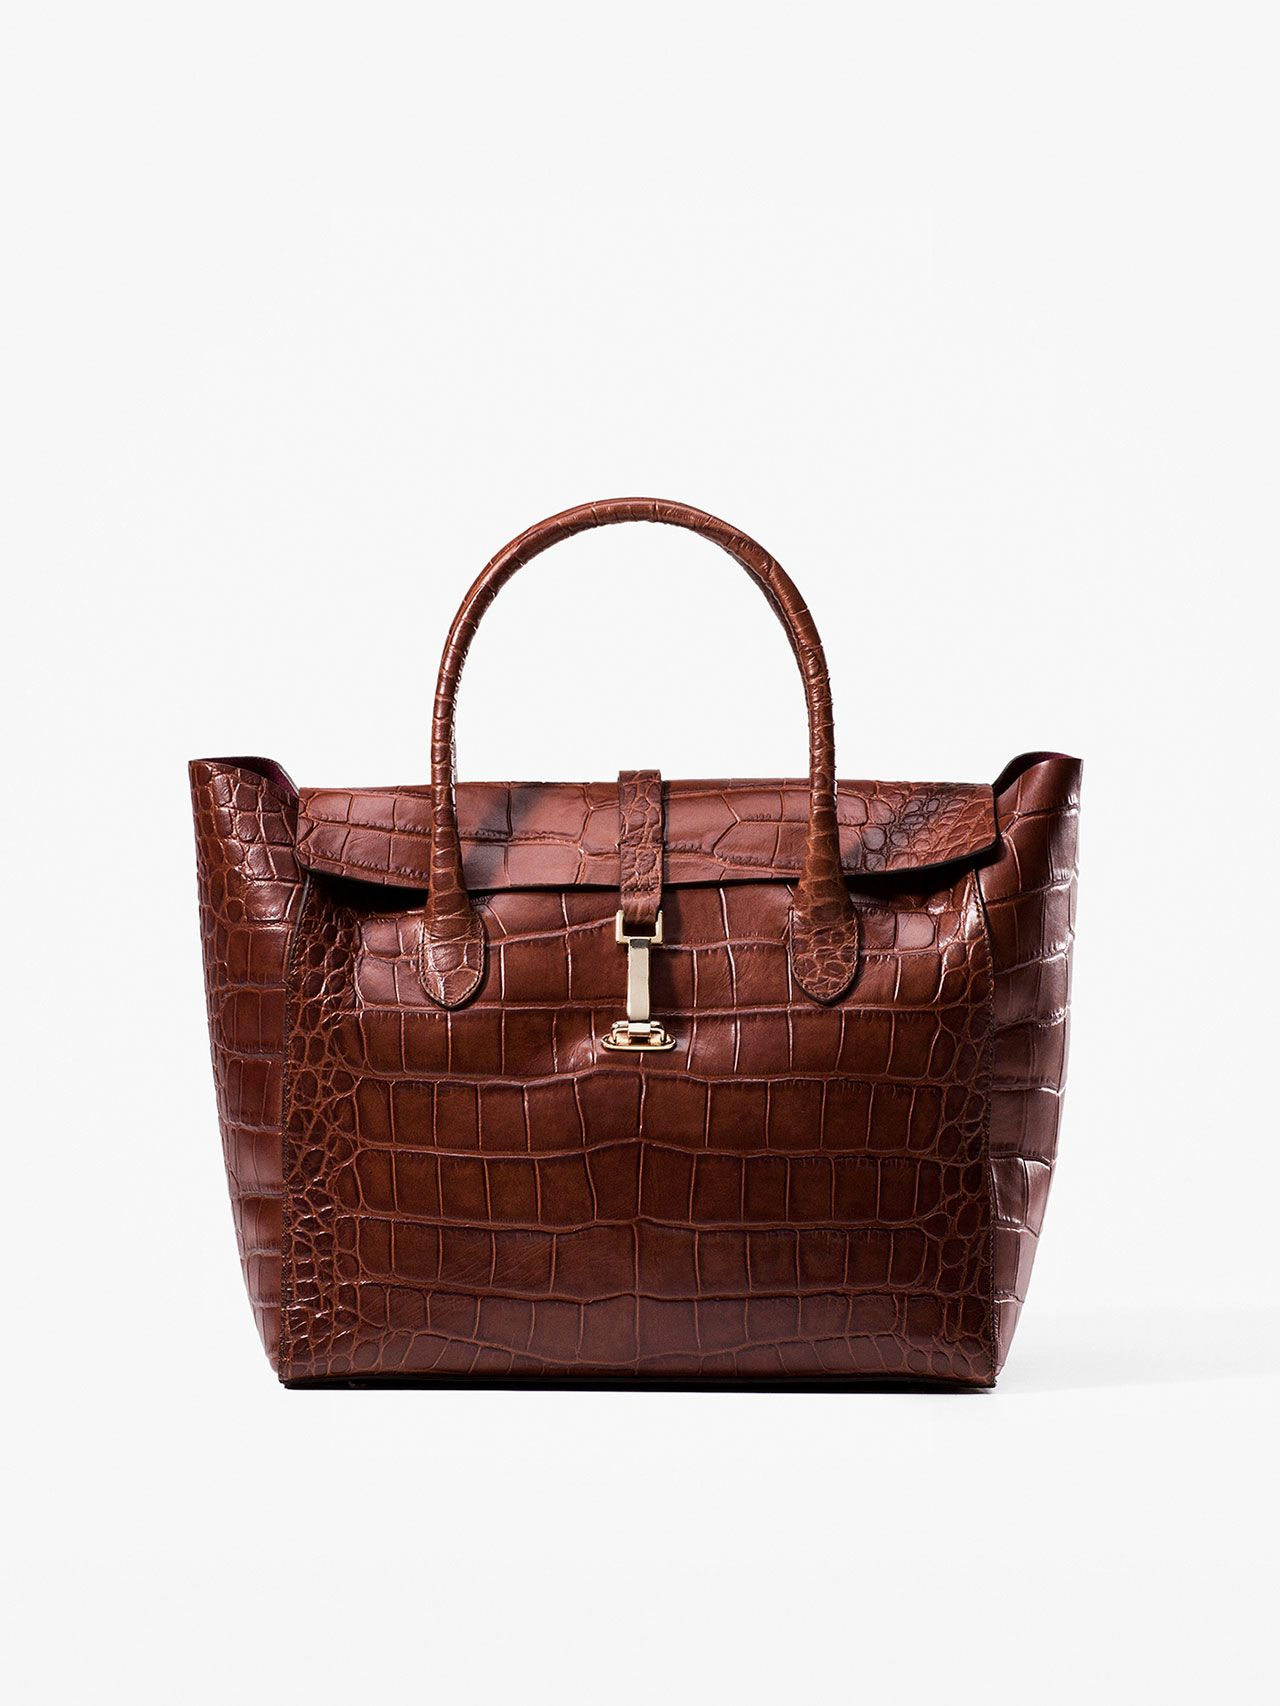 89a73bdfca0 ... best price massimo dutti bag beautiful alternative for hermès birkin bag  1e5e4 77a41